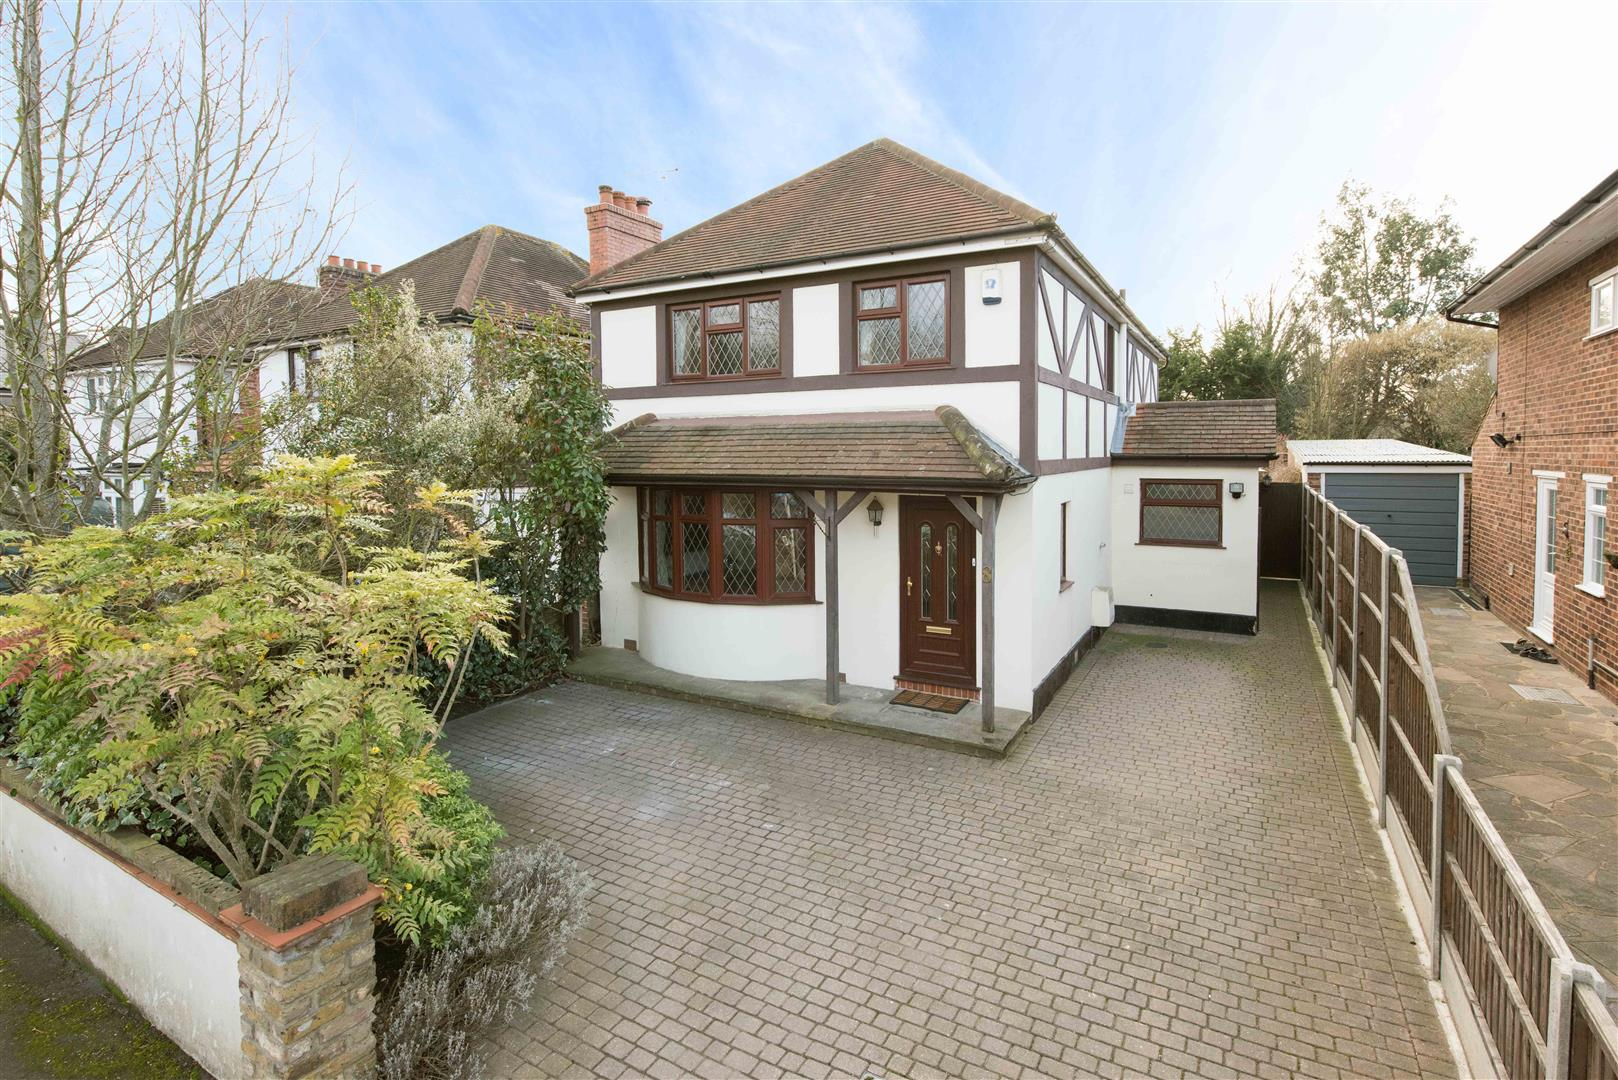 3 Bedrooms Detached House for sale in Felcott Road, Hersham, Walton-On-Thames